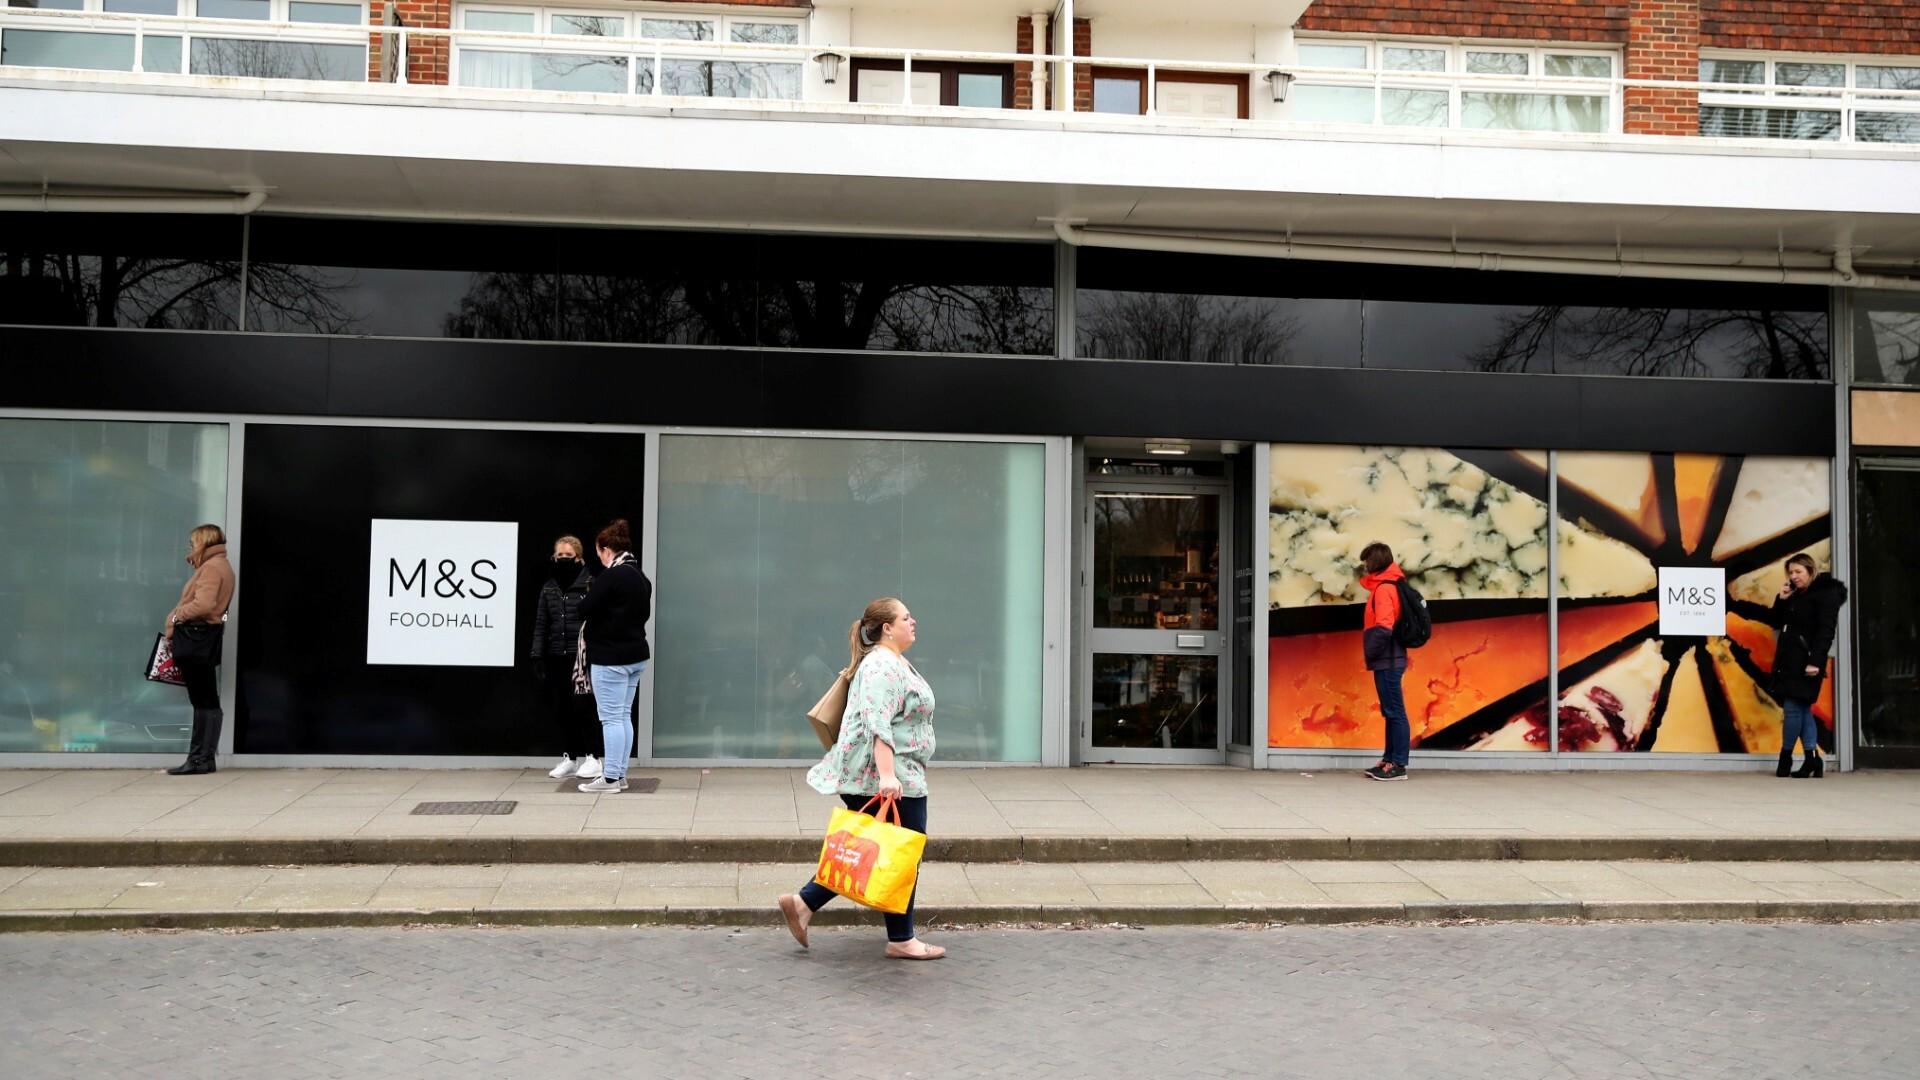 Reopening England: Growing calls to protect livelihoods